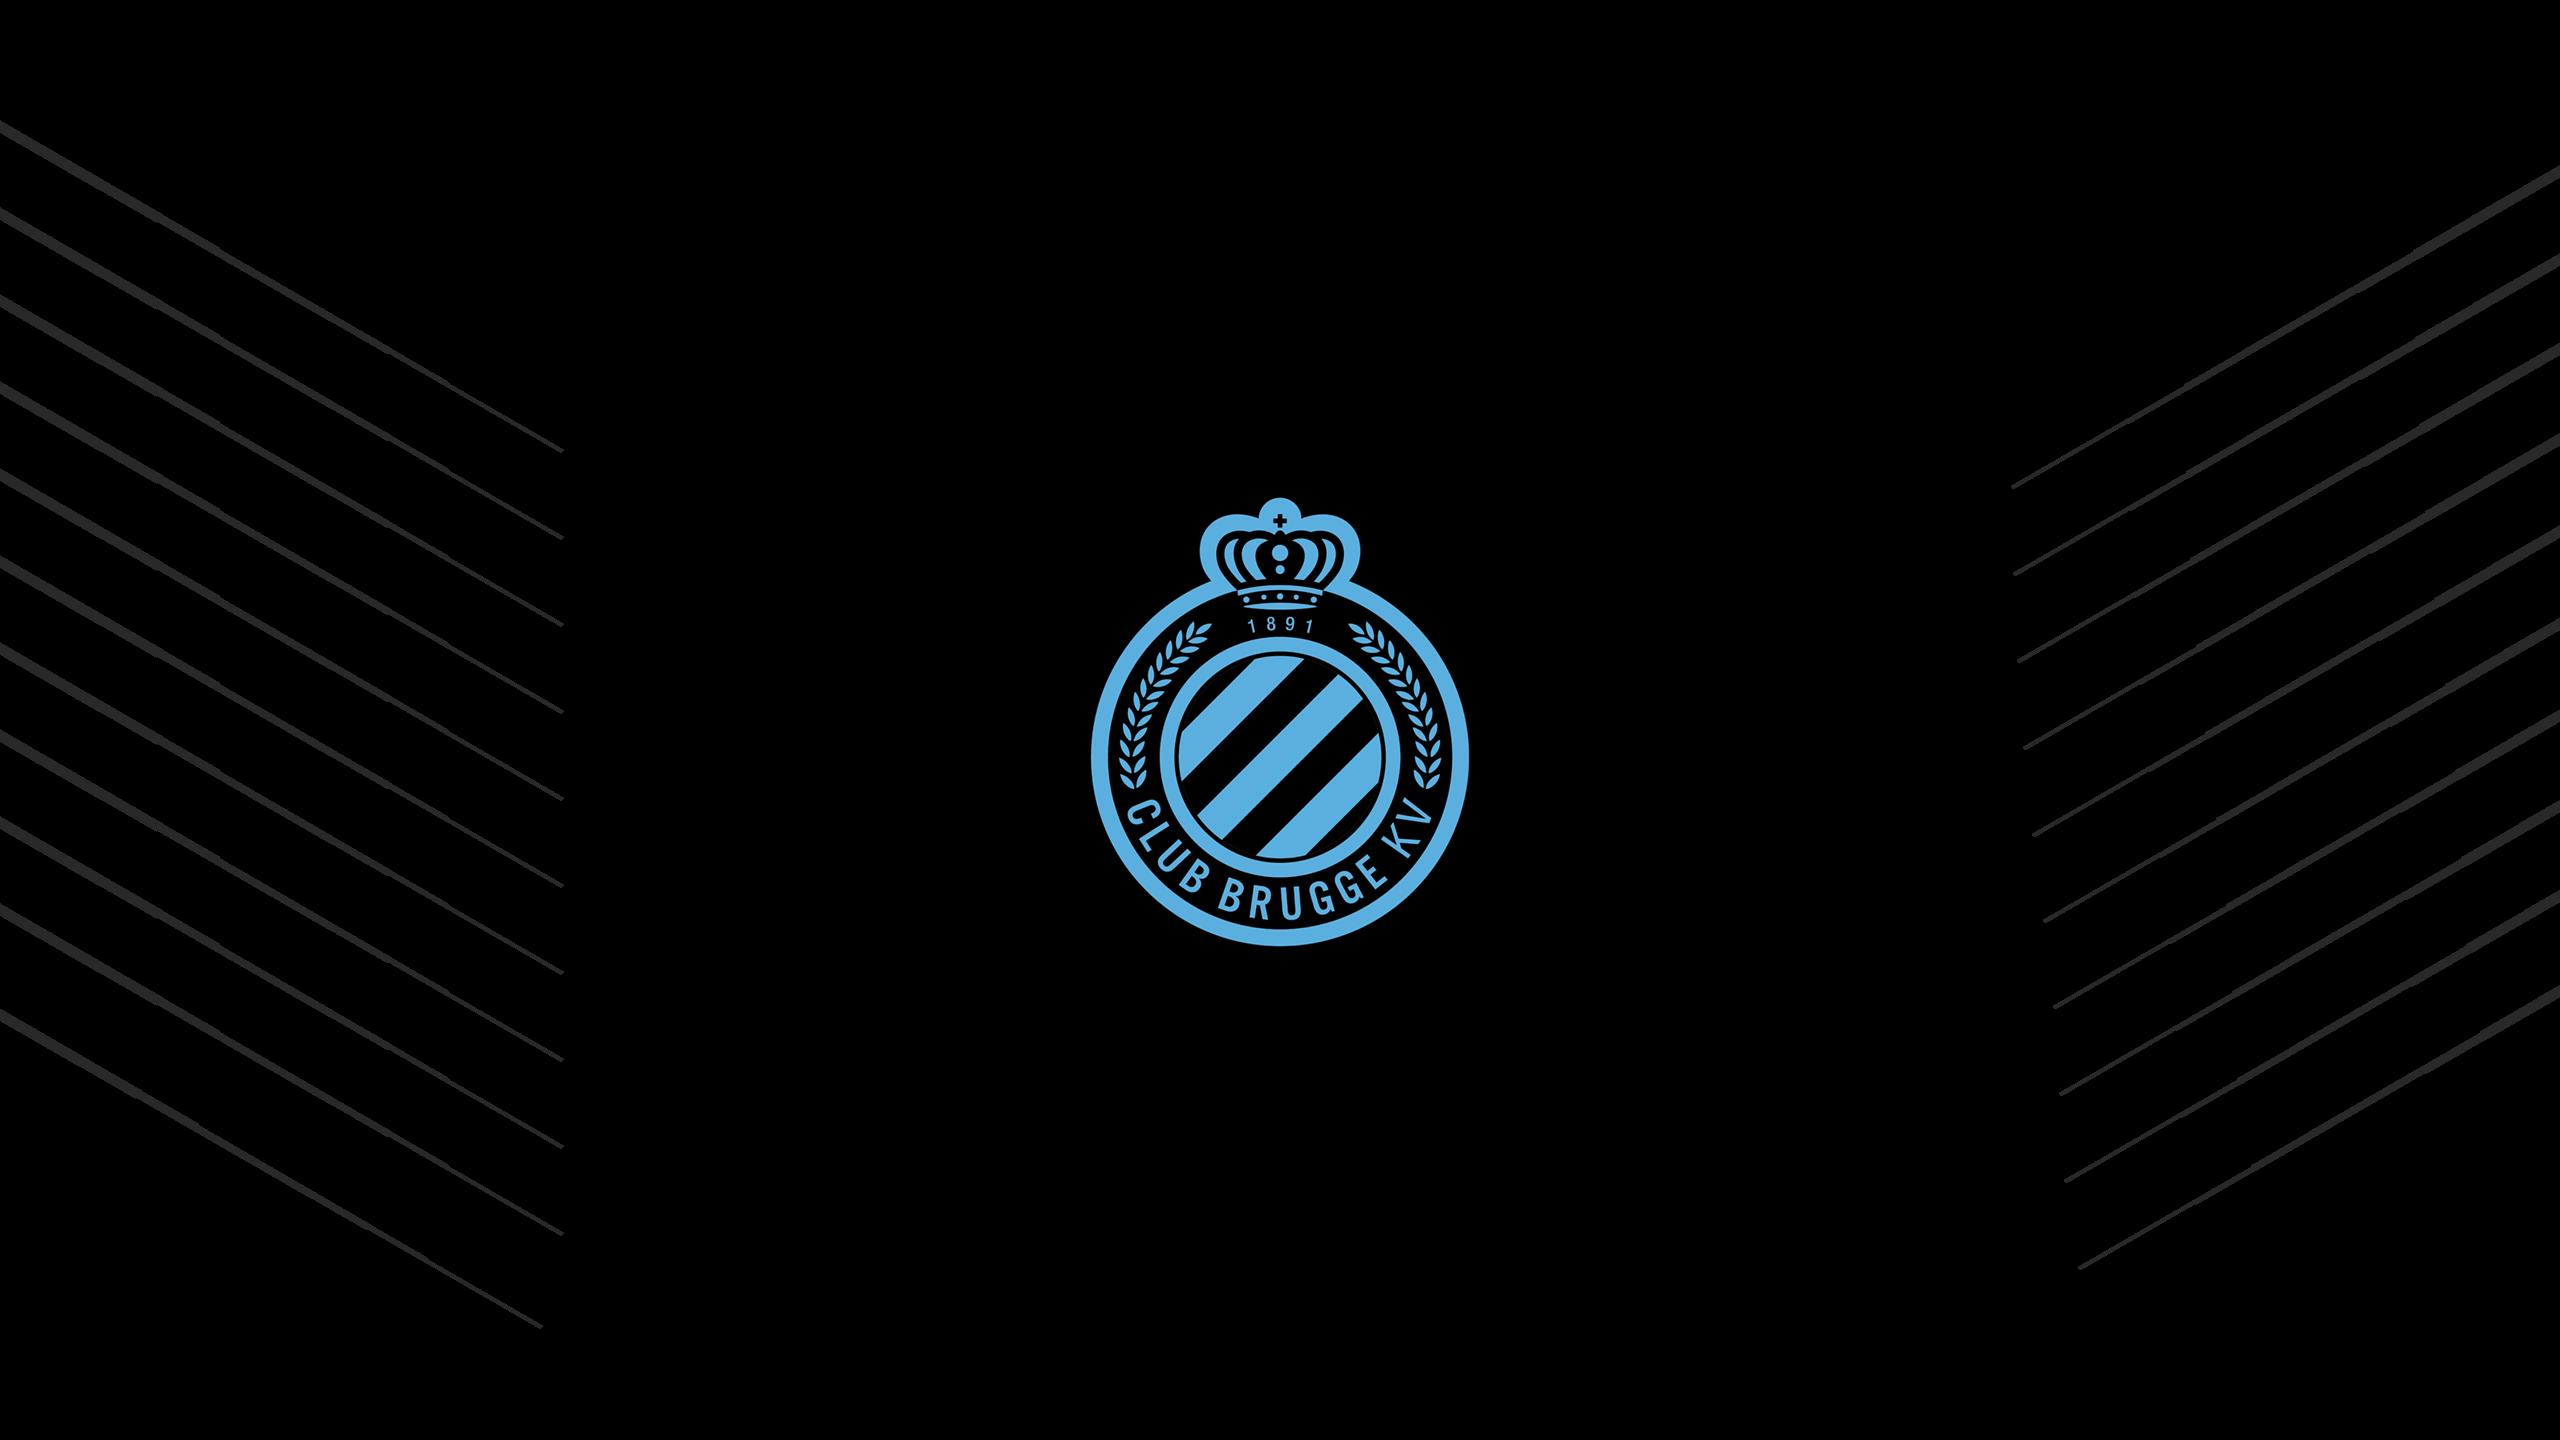 Club Brugge KV (Alt)